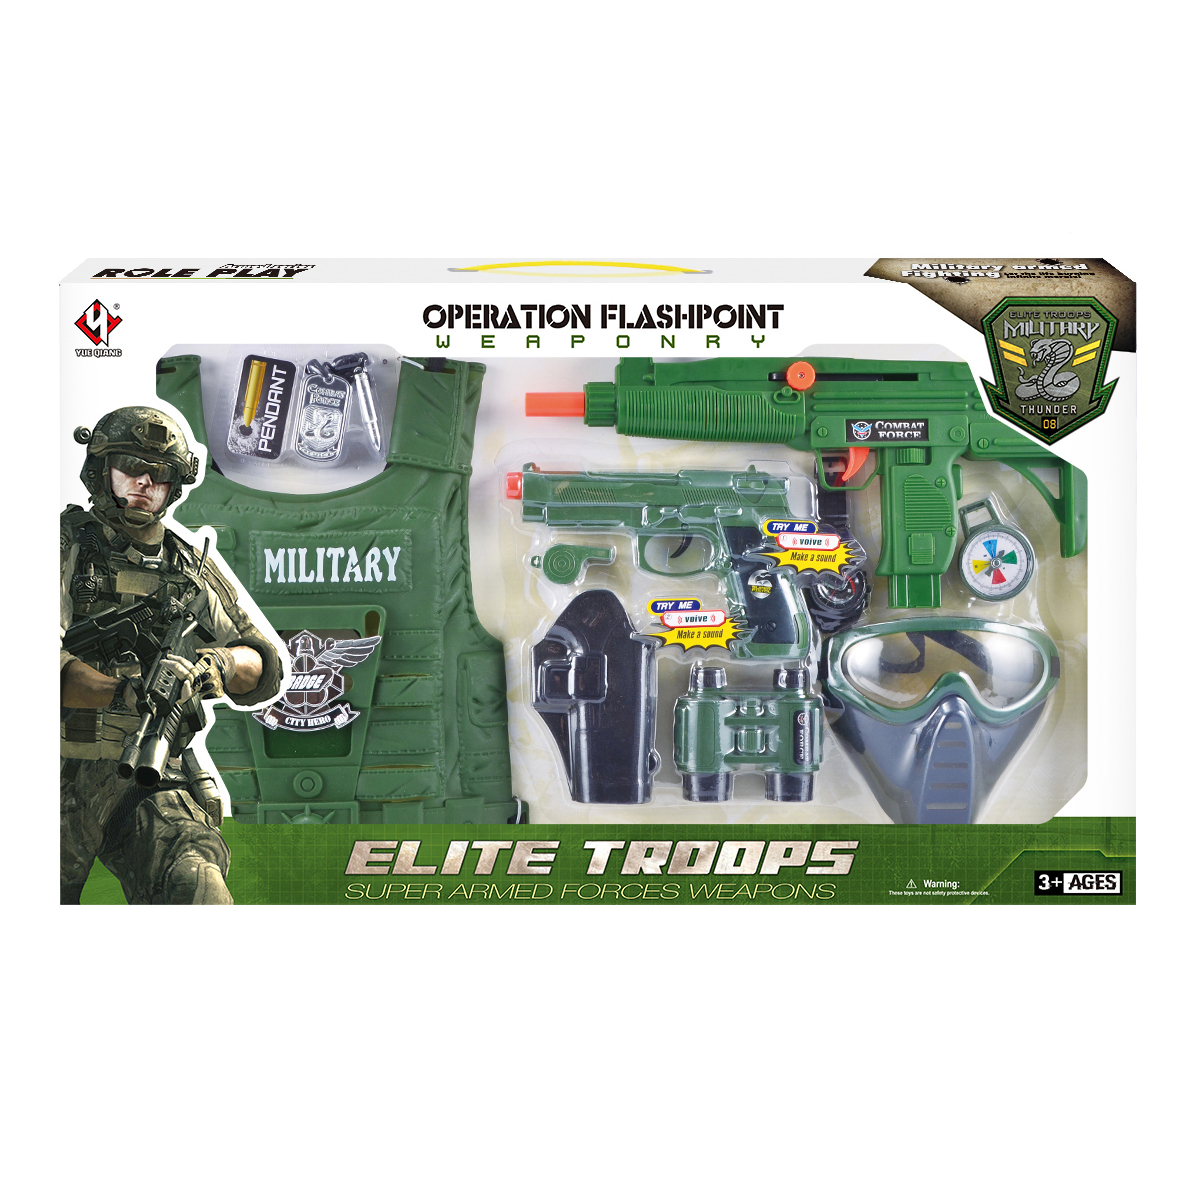 Set Accesorii Armata Military Thunders, 10 Piese